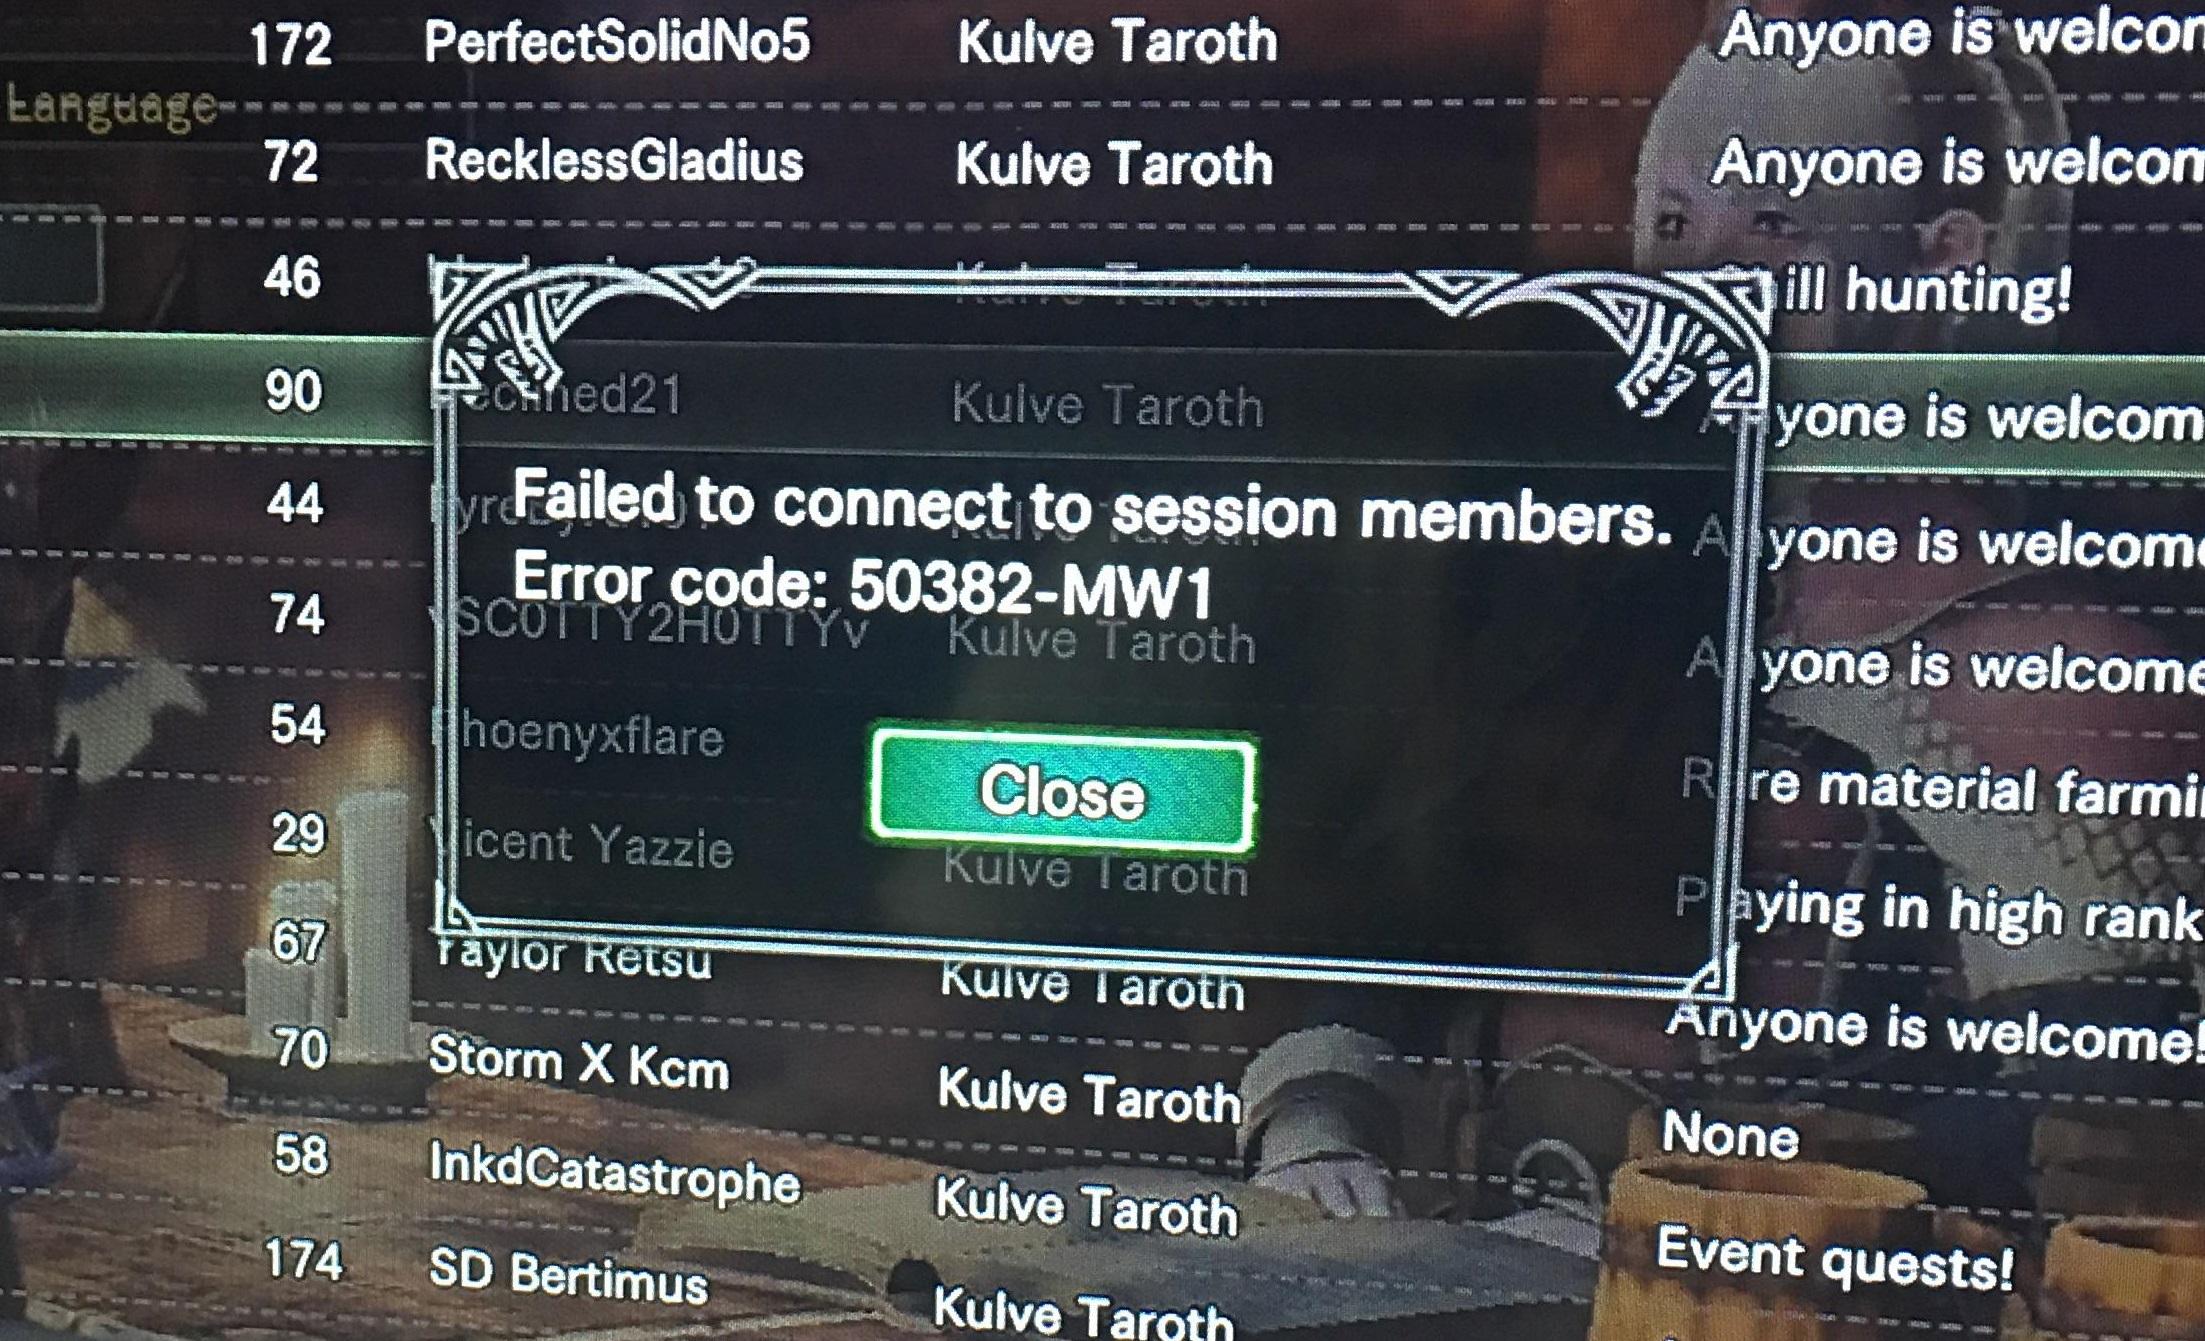 error code 50382-MW1